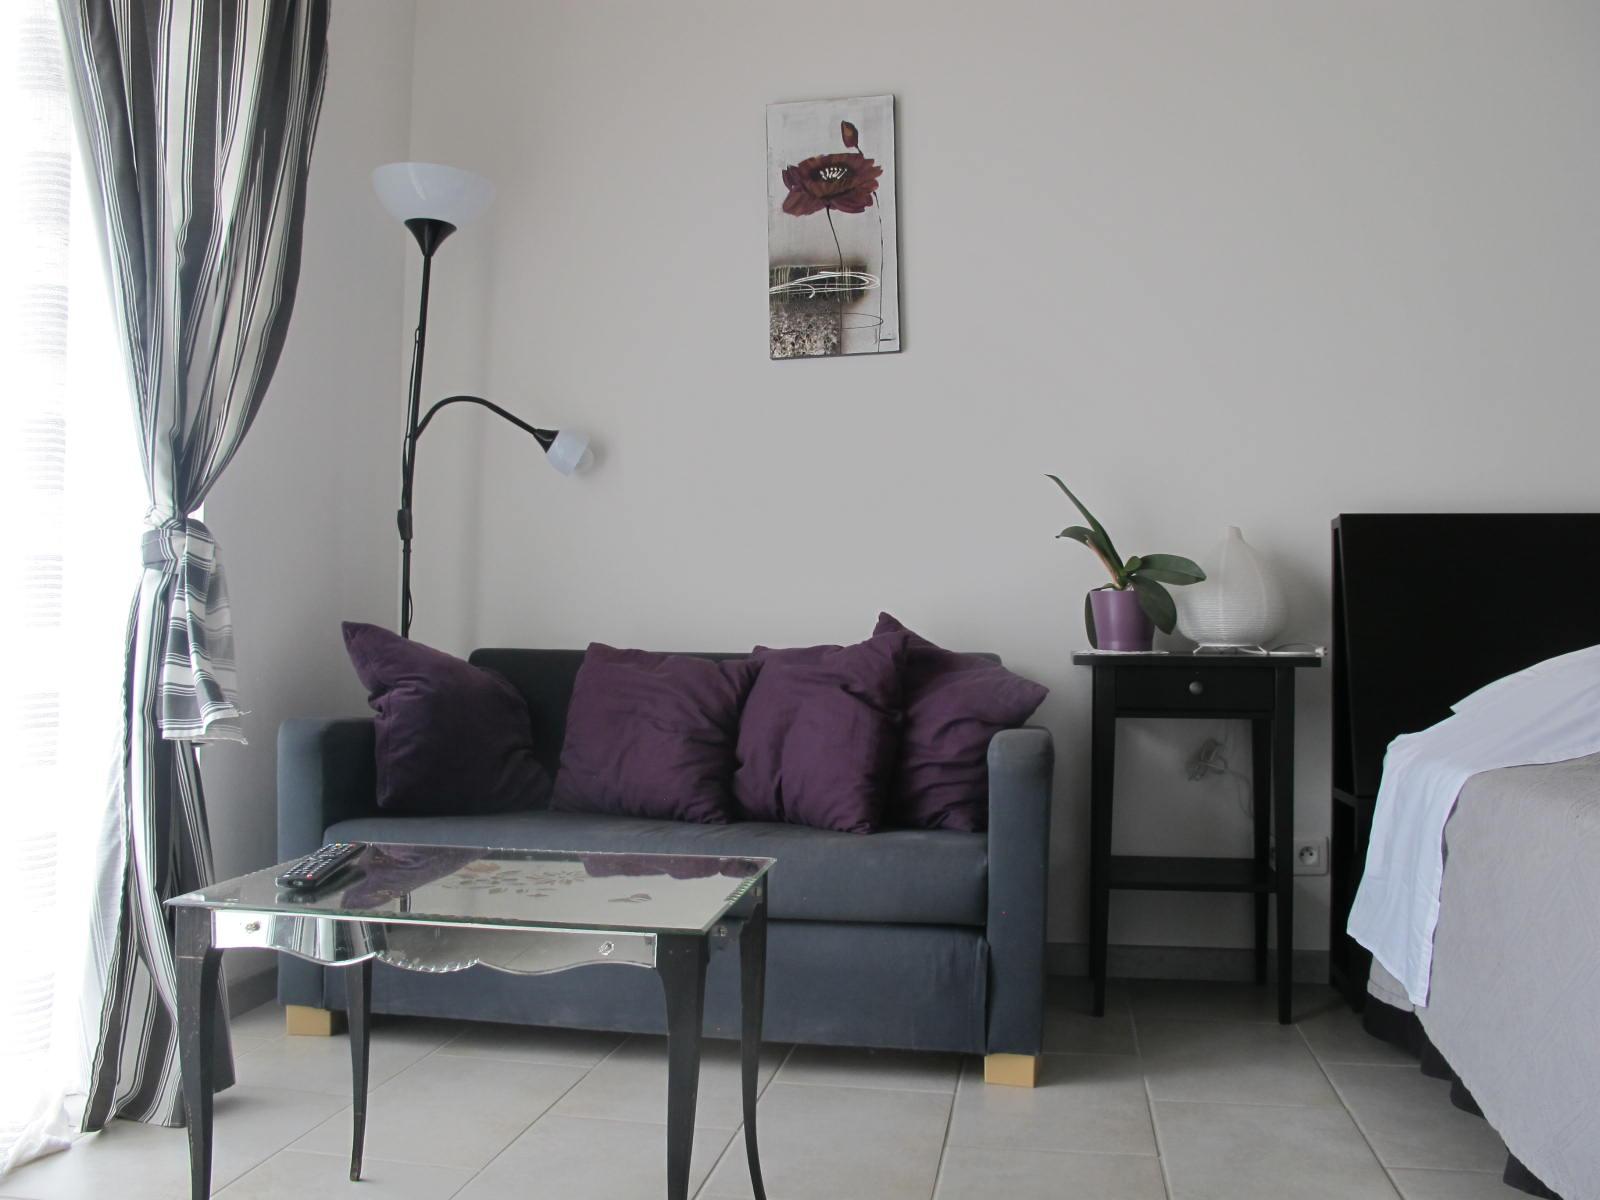 loucardaline-bedoin-ventoux-chambre d hotes-vaucluse-double confort-coin sallon